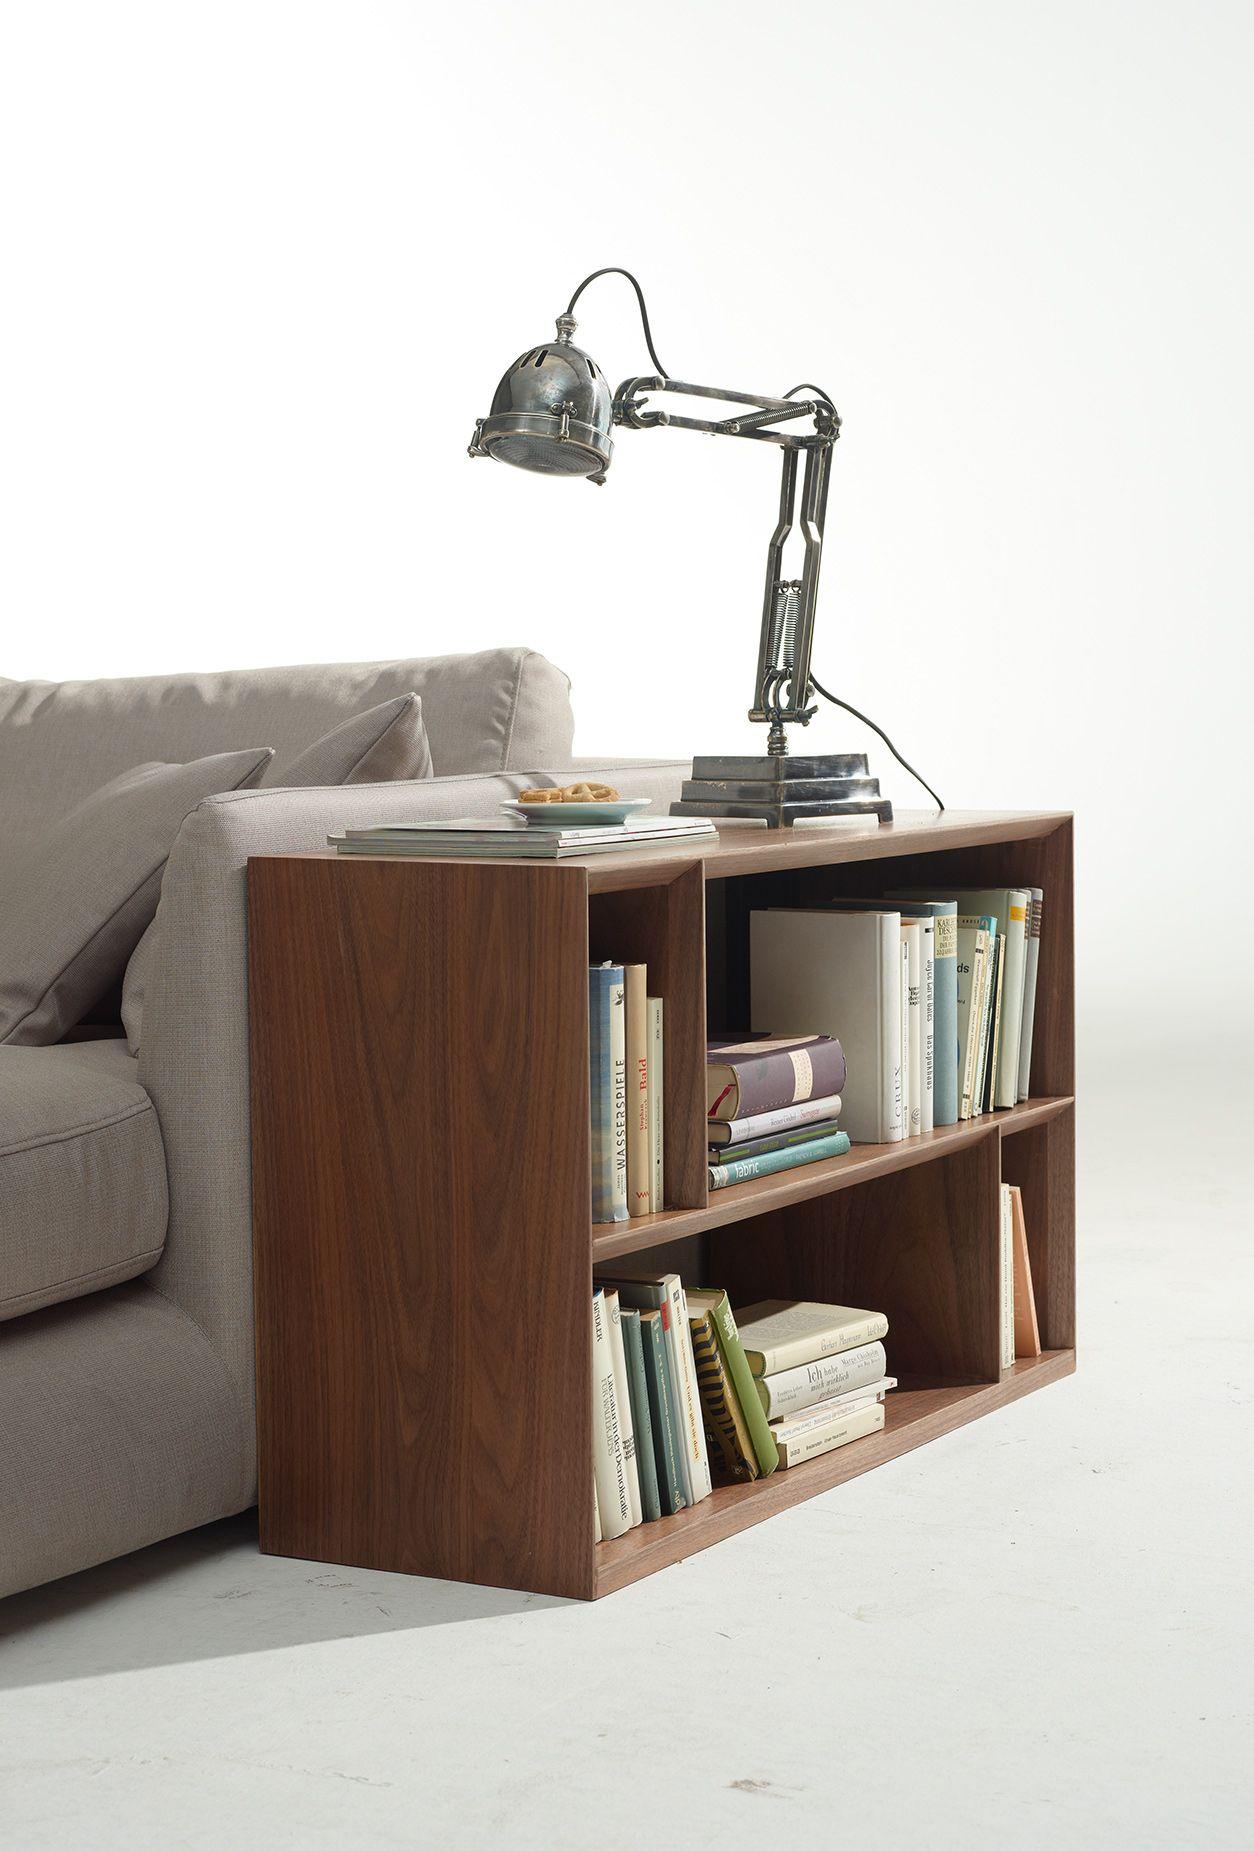 ablage sofa interesting fantastisch couchtisch mit ablage lara g with ablage sofa cool with. Black Bedroom Furniture Sets. Home Design Ideas